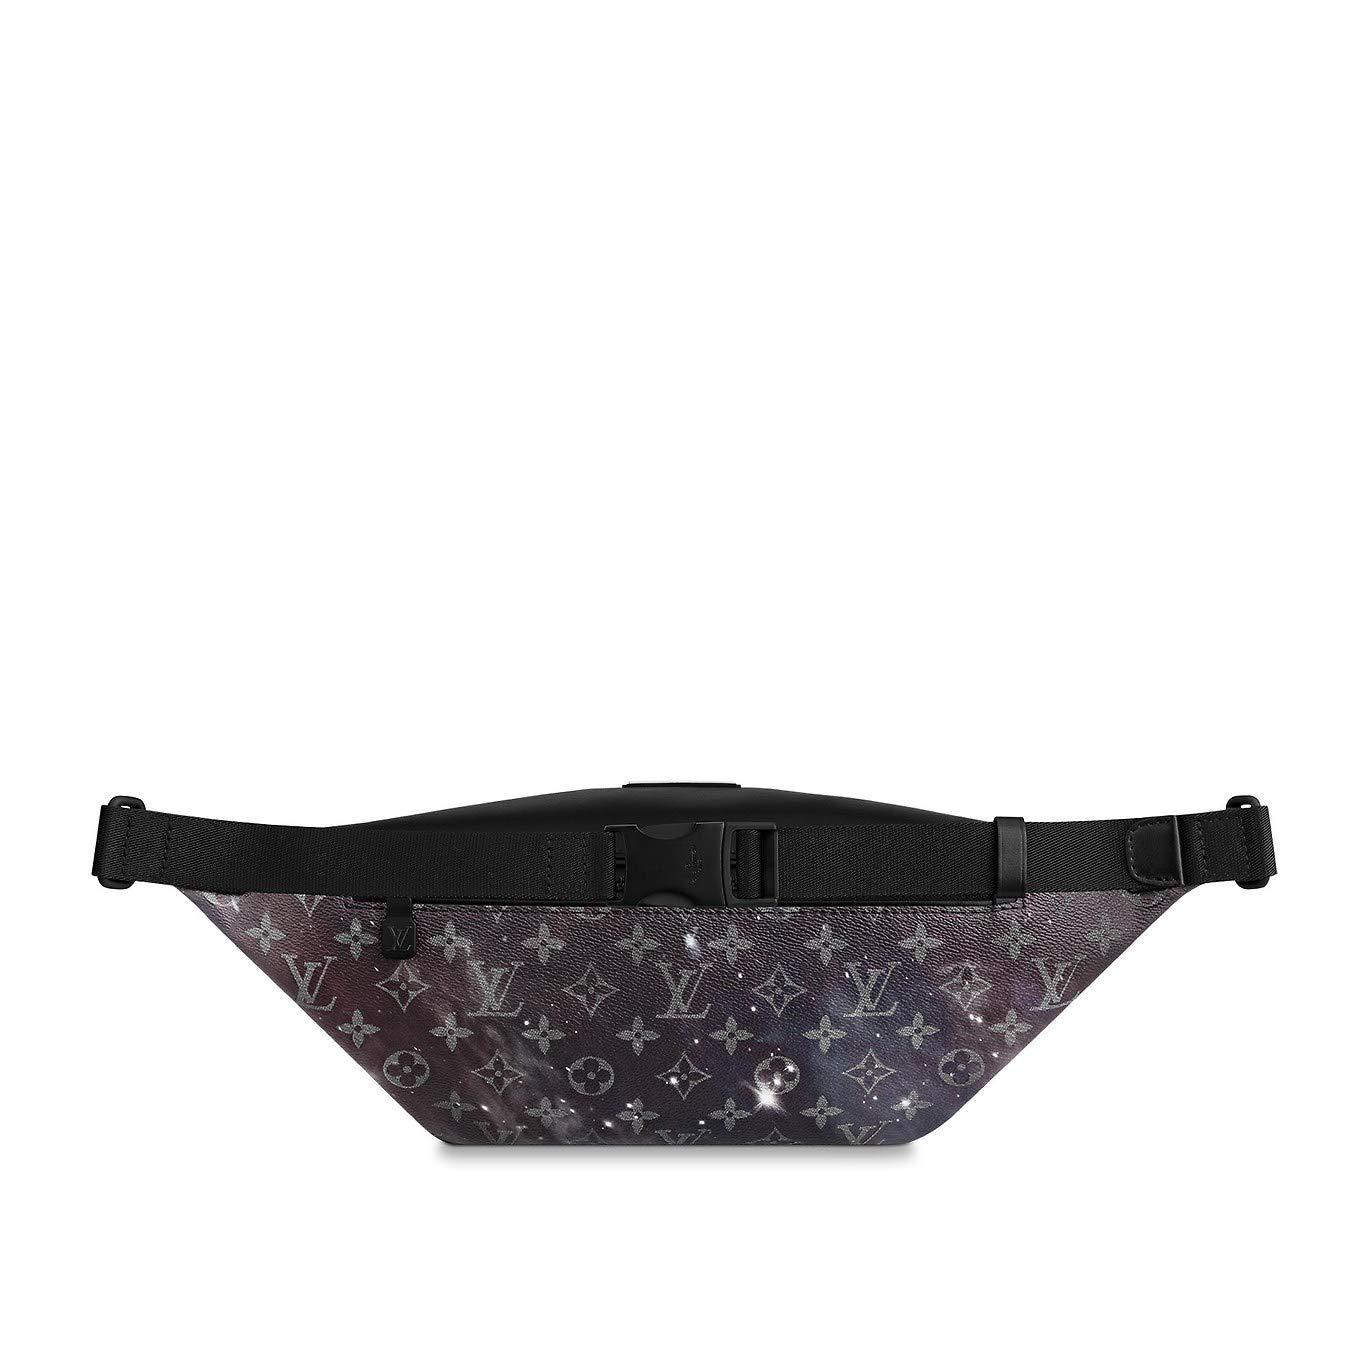 04e6545be881f Amazon.com  NE-LV Men s Discovery Bumbag Waist Packs  Sports   Outdoors